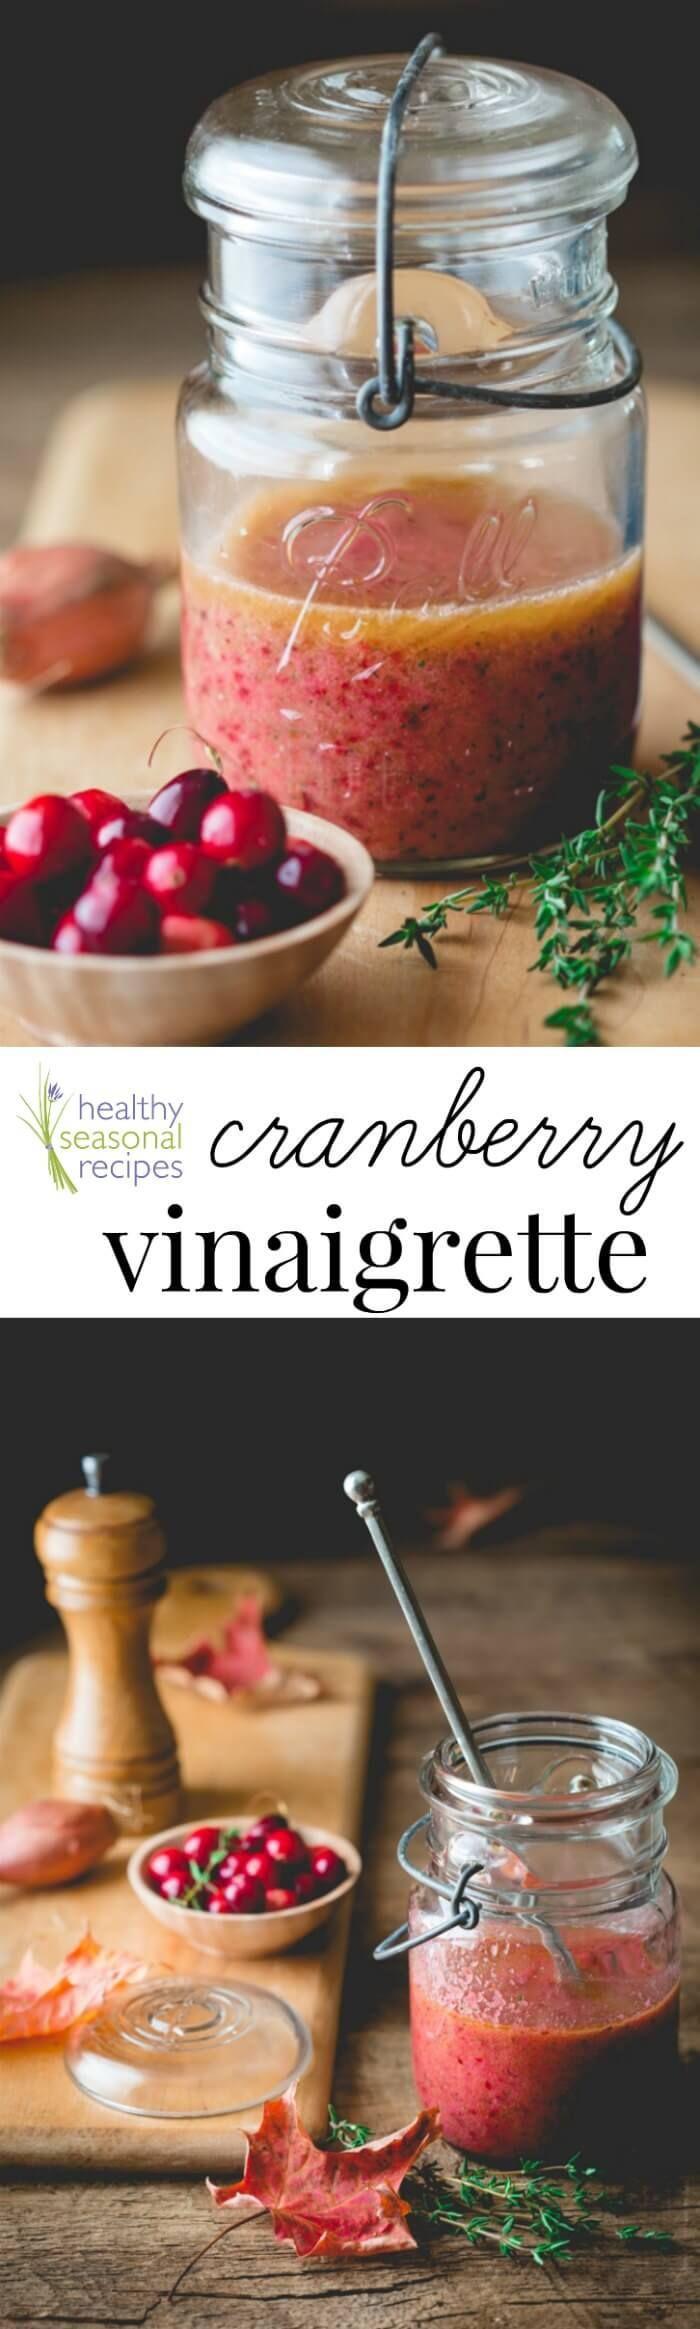 Cranberry Vinaigrette on Healthy Seasonal Recipes | Clean Eating | Gluten-free | Vegan | Gluten-free